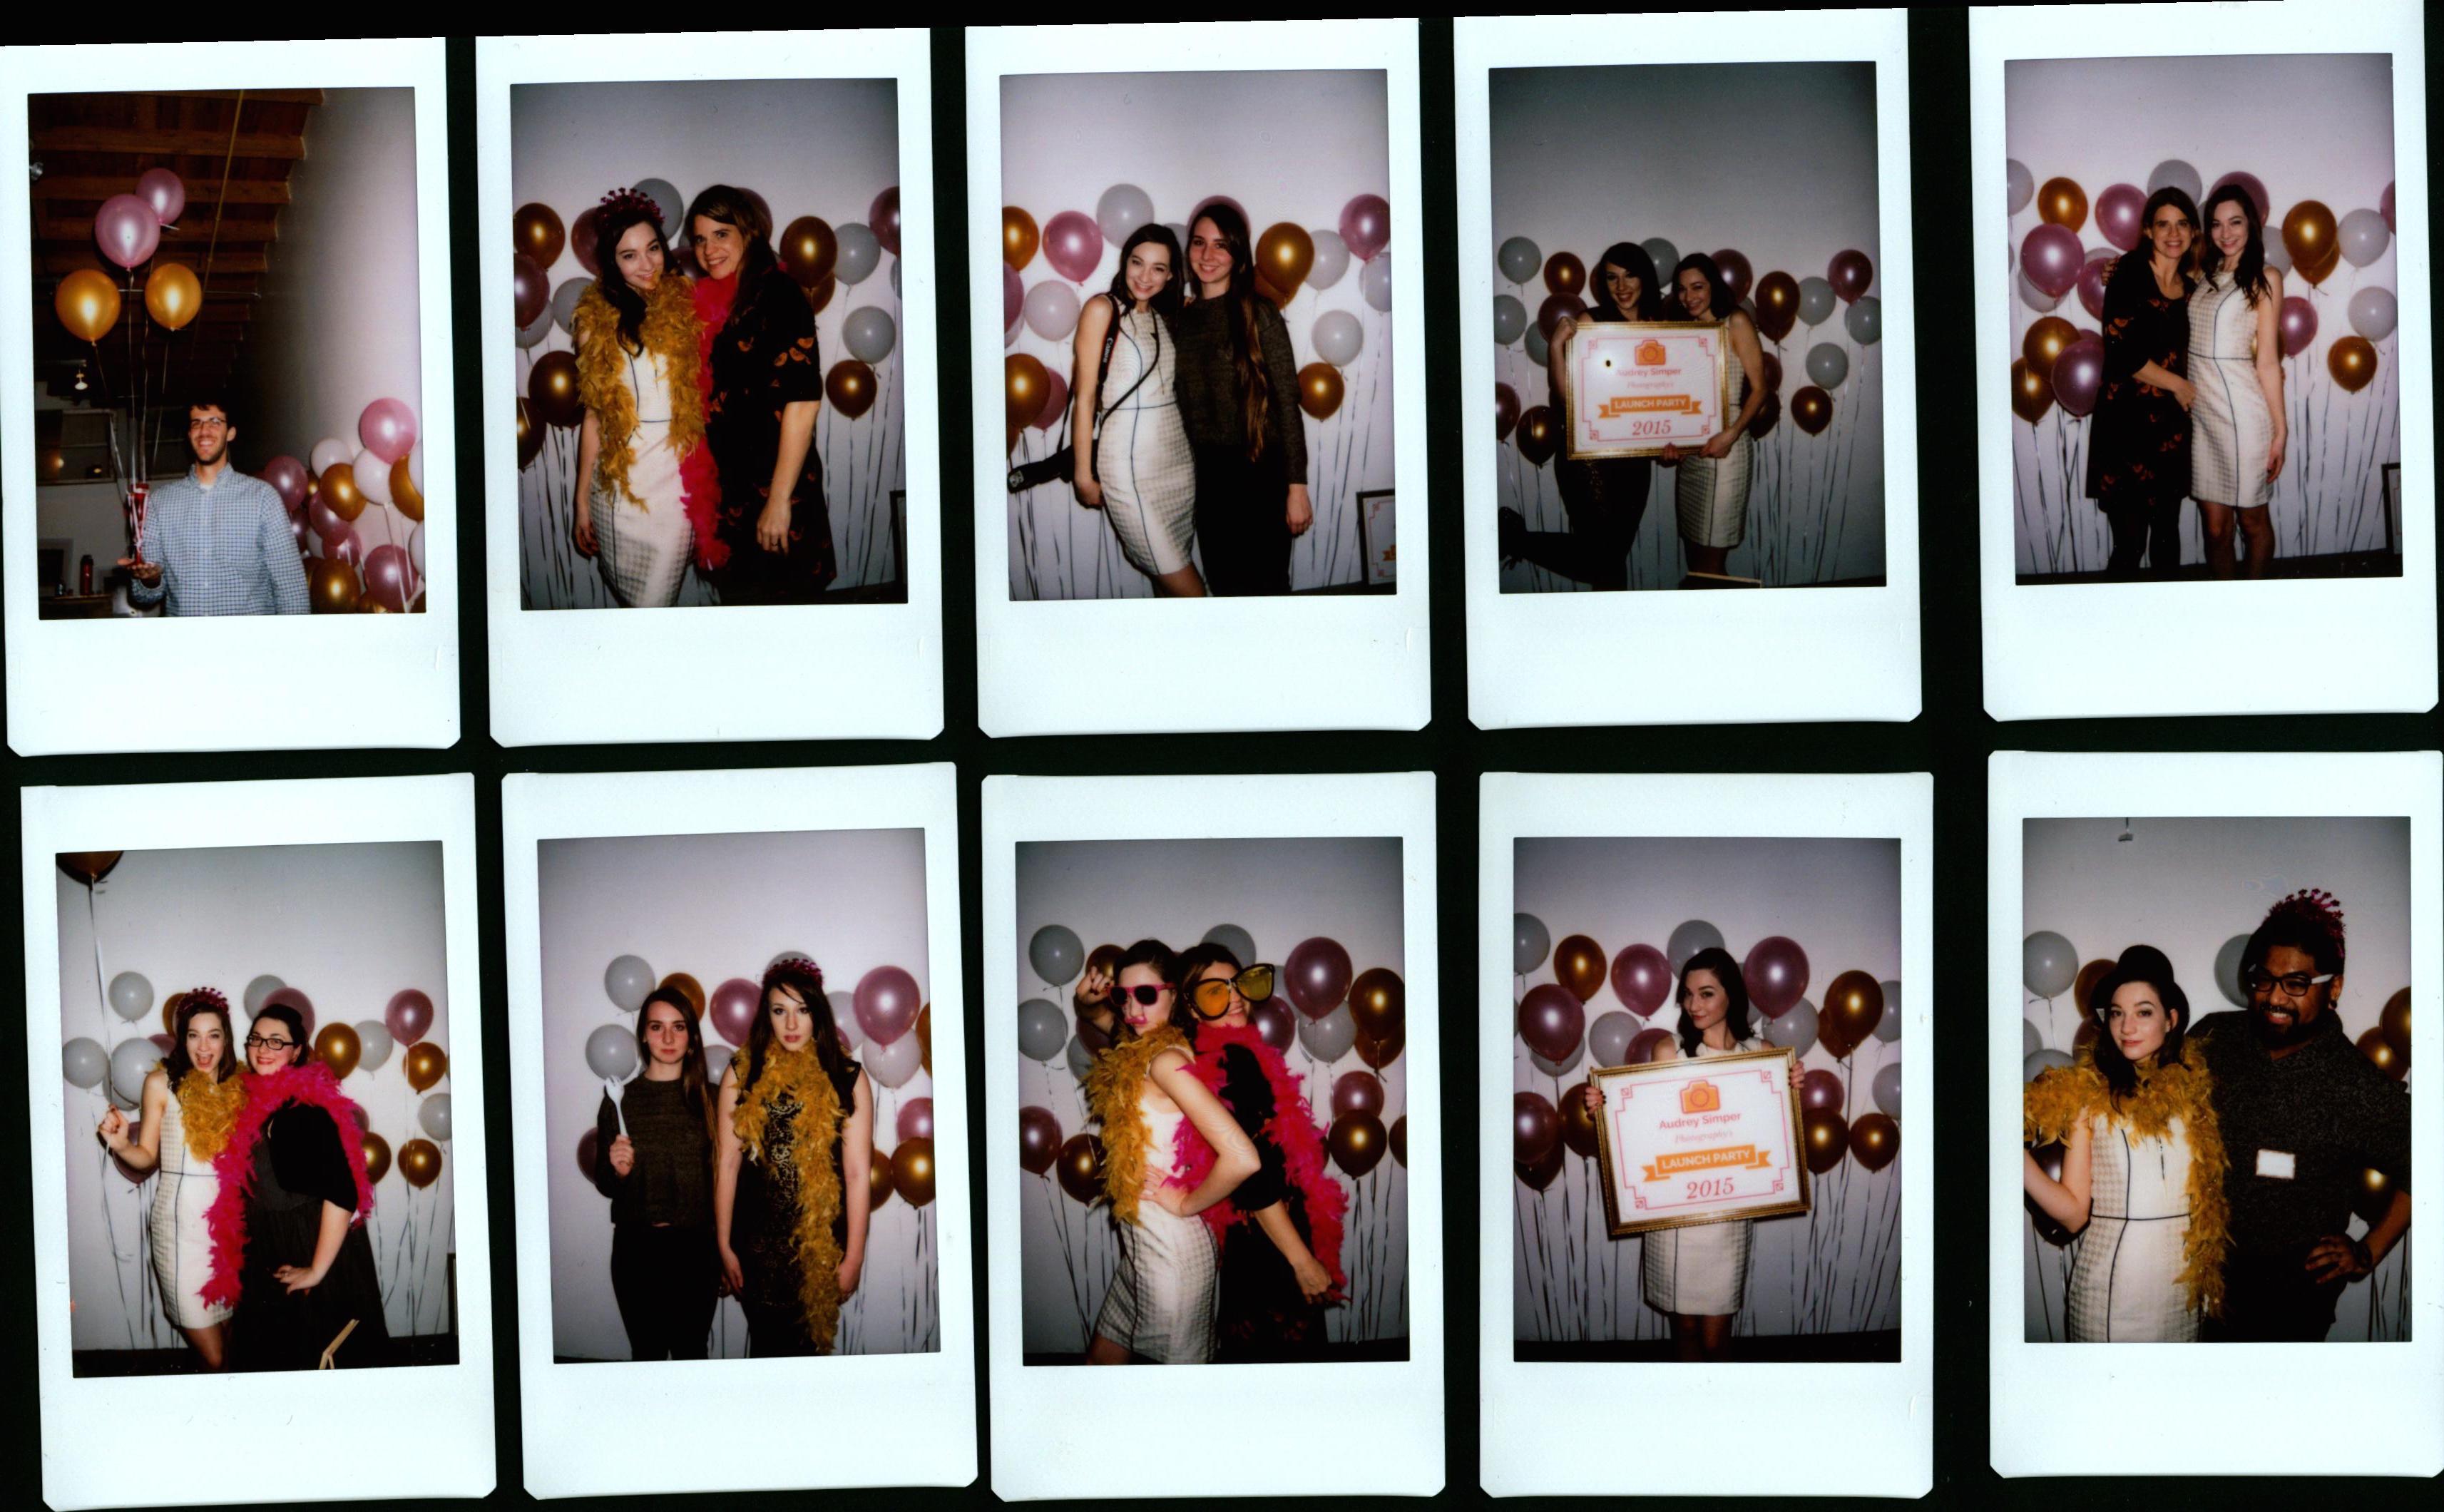 polaroid instax launch party selfie station ideas photogaphy